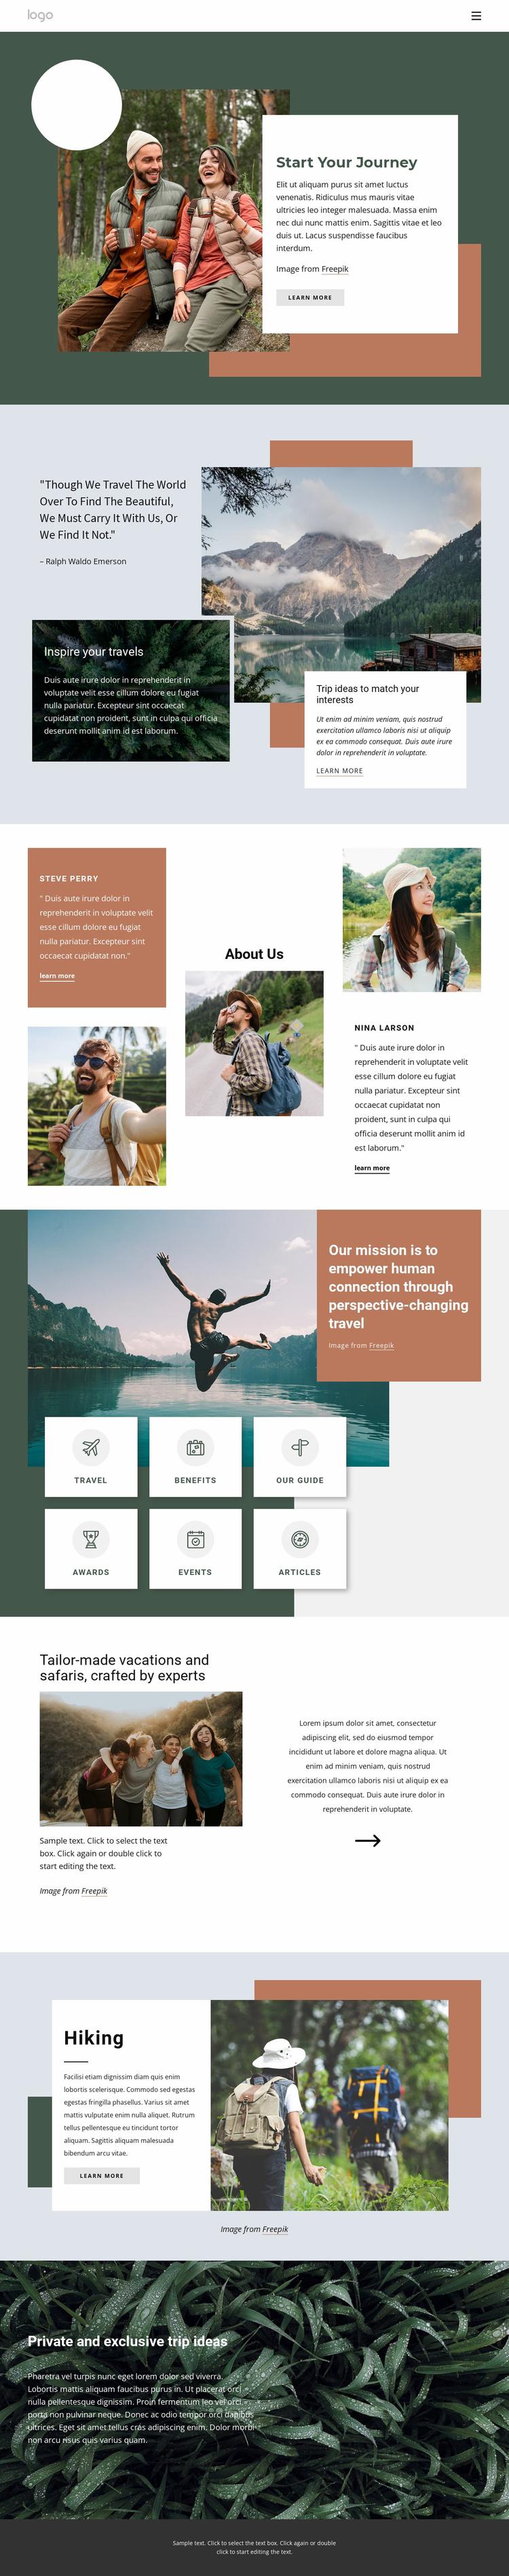 Adventure travel company Website Template